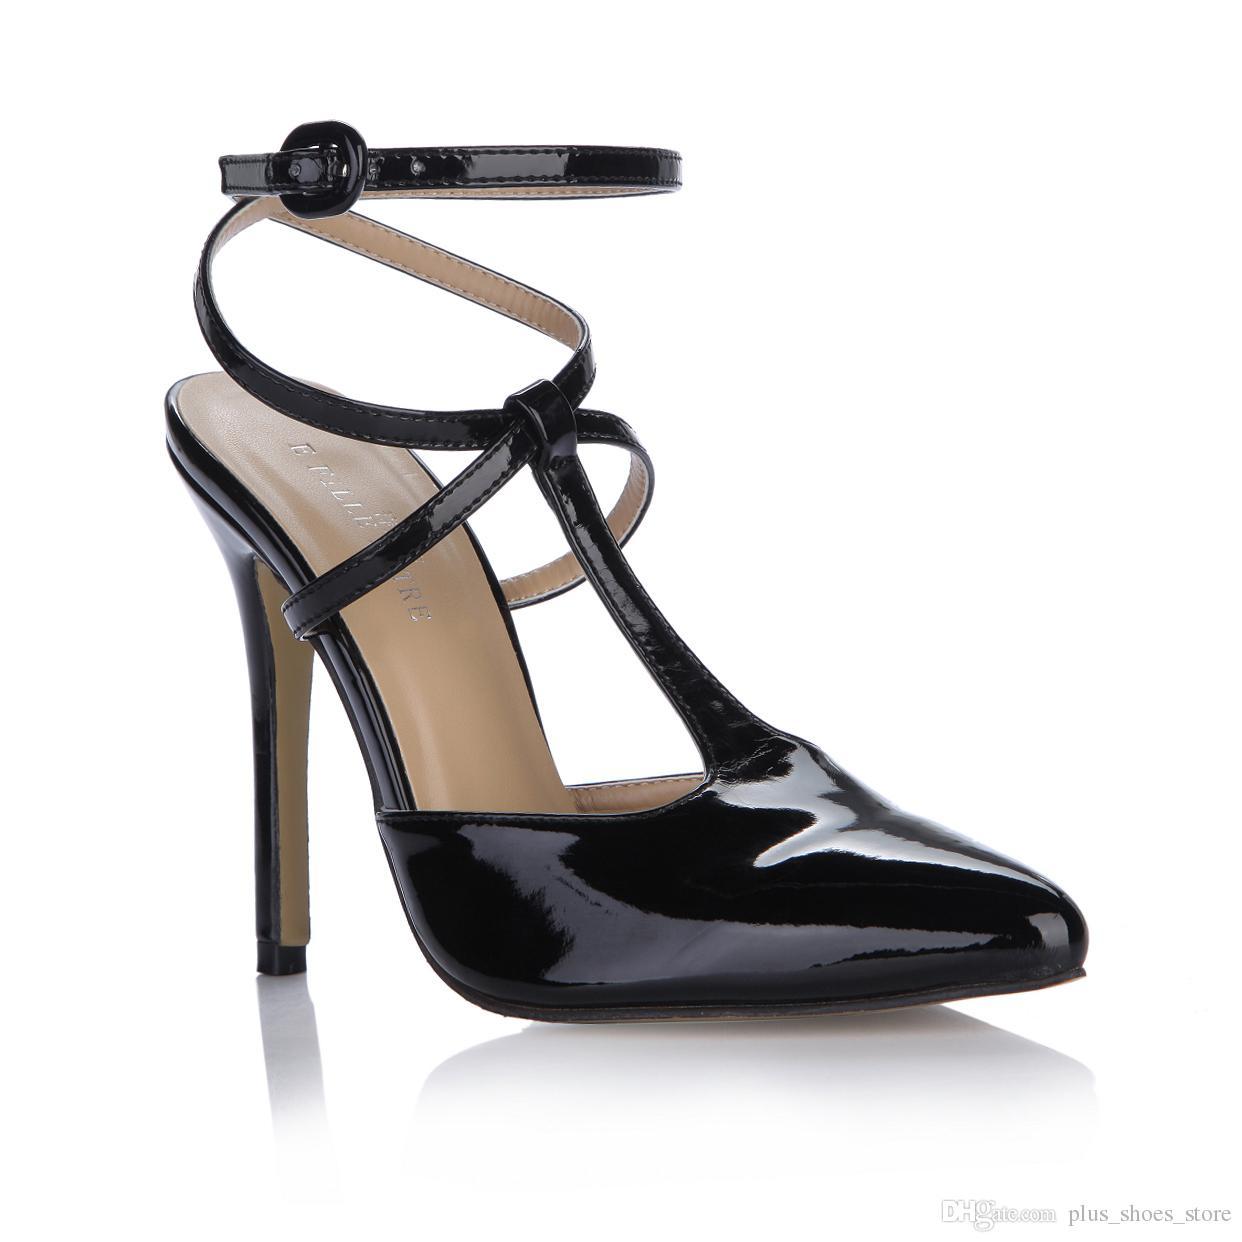 77638c08a36 Black Patent Leather Women Sandals Shoes 2017 Plus Size Ladies Party Shoes  Pointed Toe T Strap Buckle Strap Shoes Pumps Platform Shoes Prom Shoes From  ...